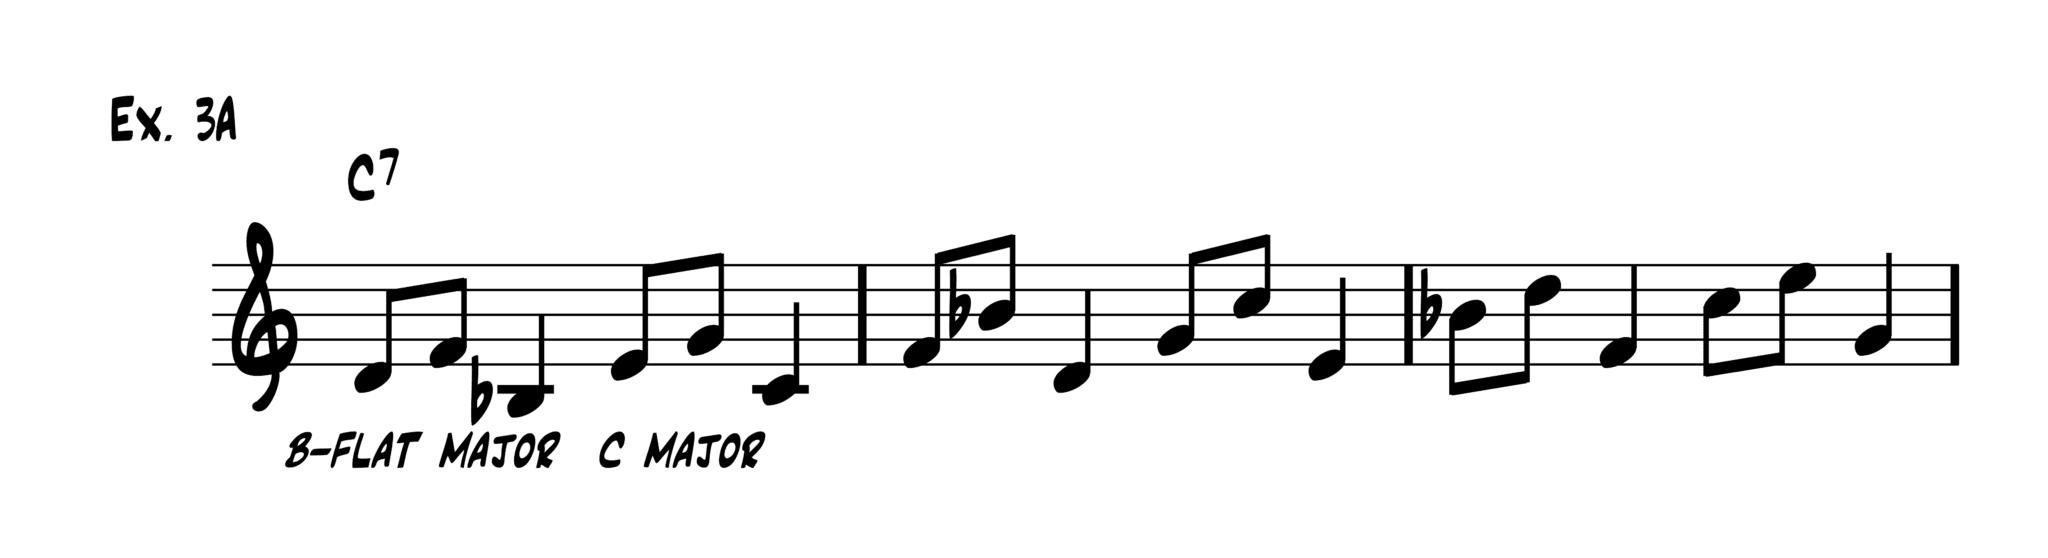 9 Triad Pairs That Sound Great | You'll Hear It